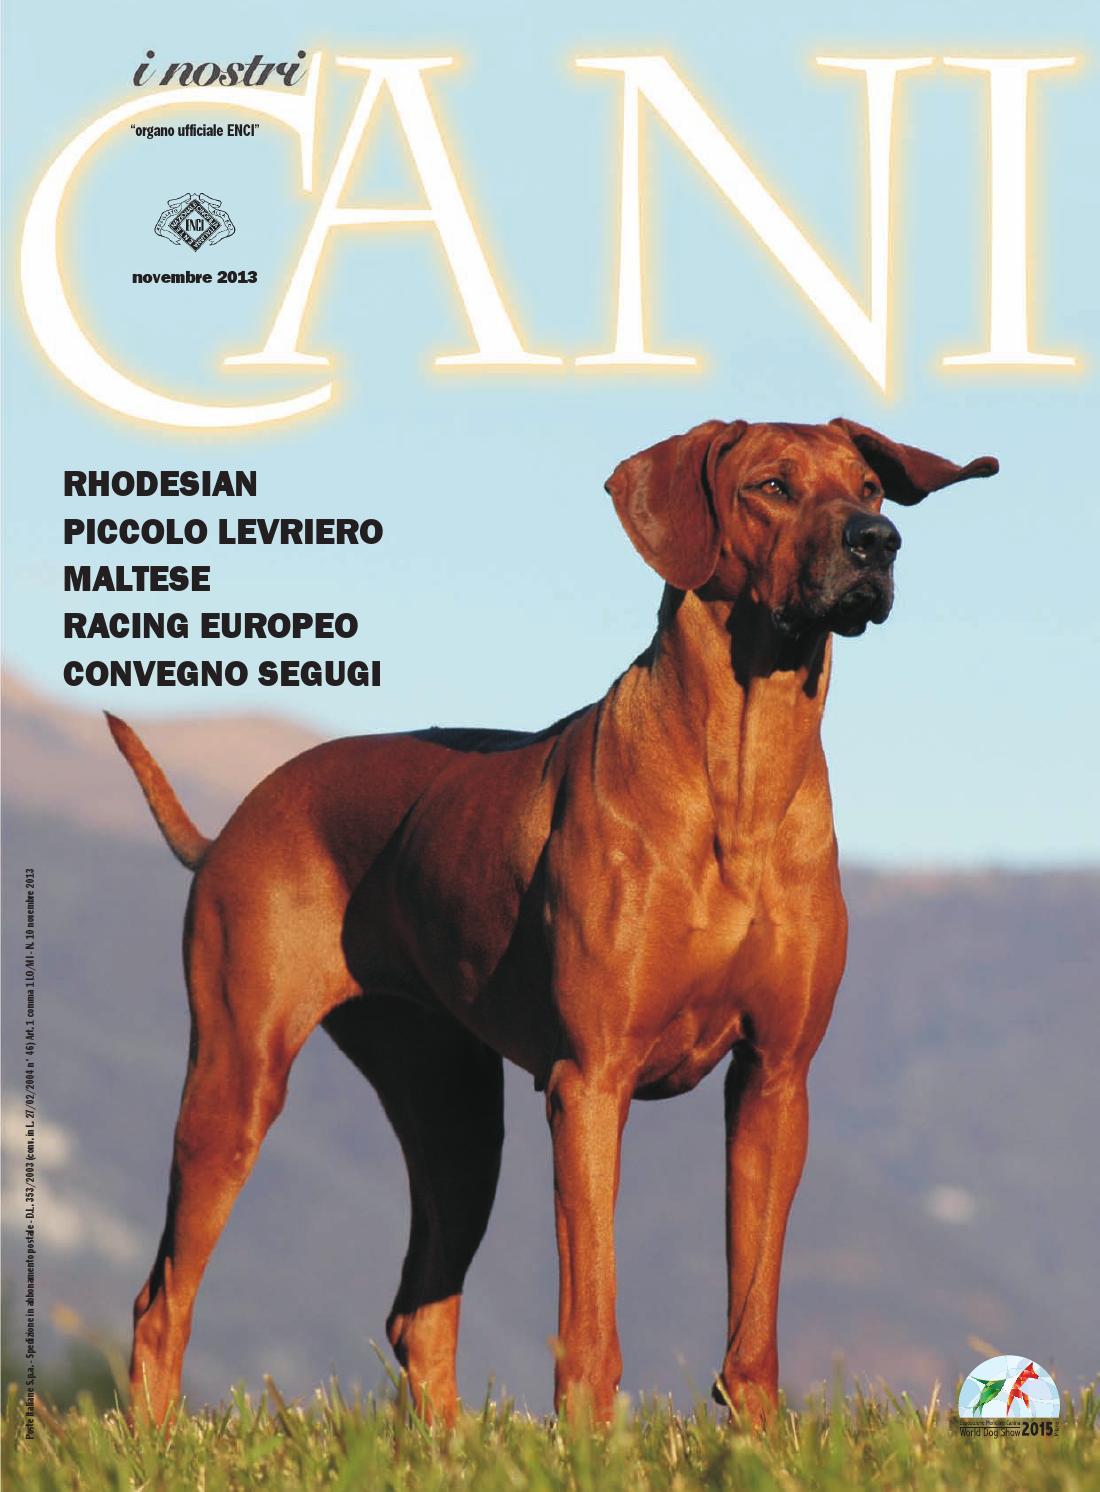 ISSUU - I Nostri Cani - novembre 2013- by ENCI - Ente Nazionale ...